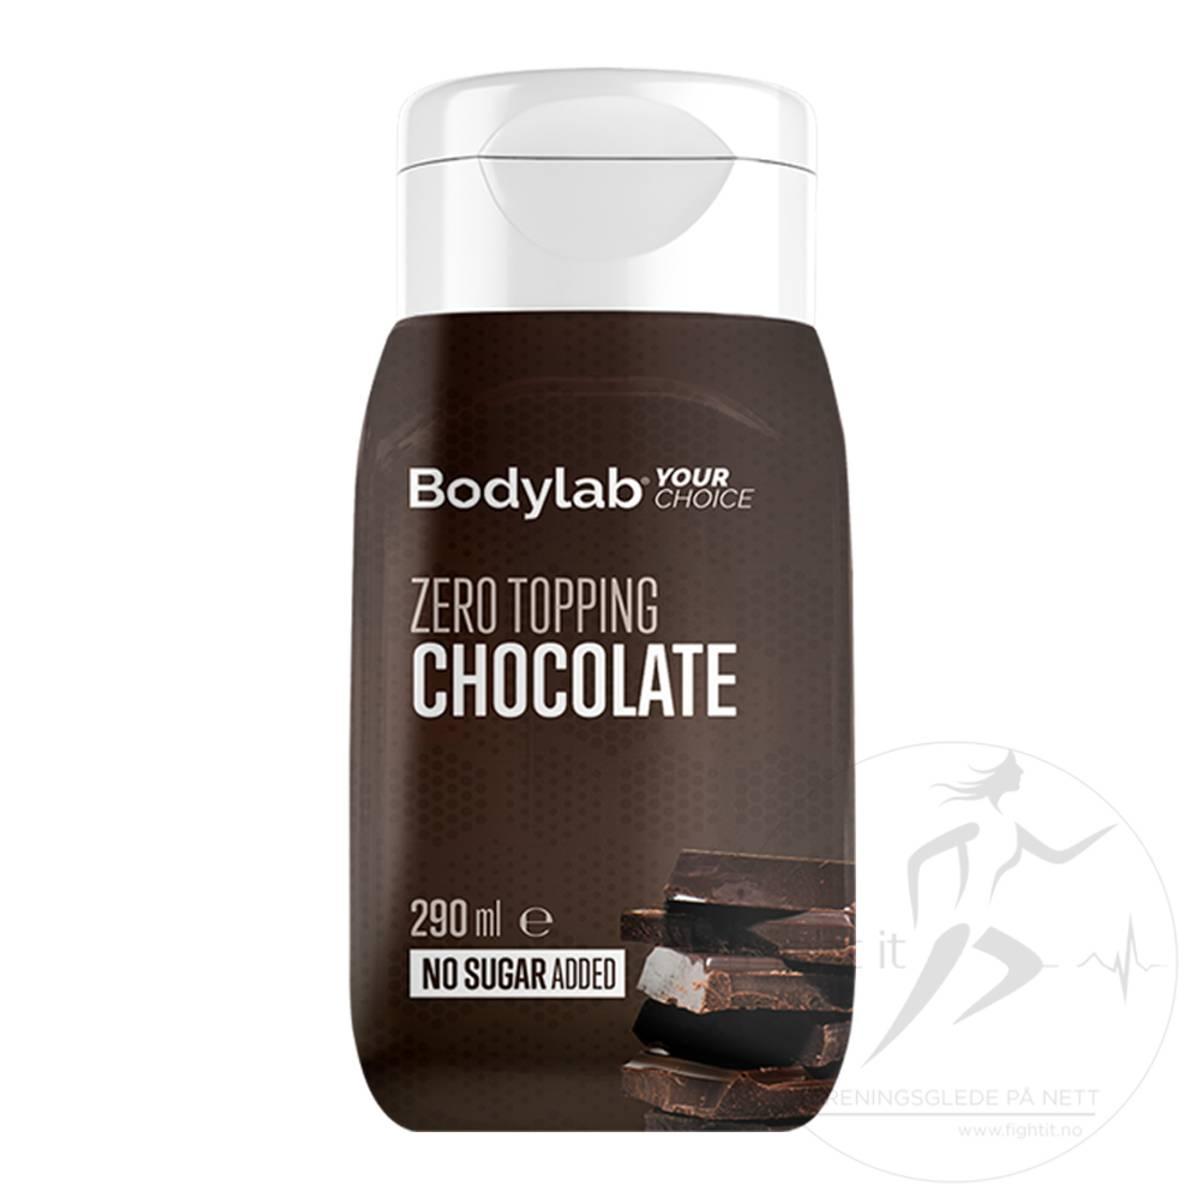 Bodylab - Zero Topping 290ml